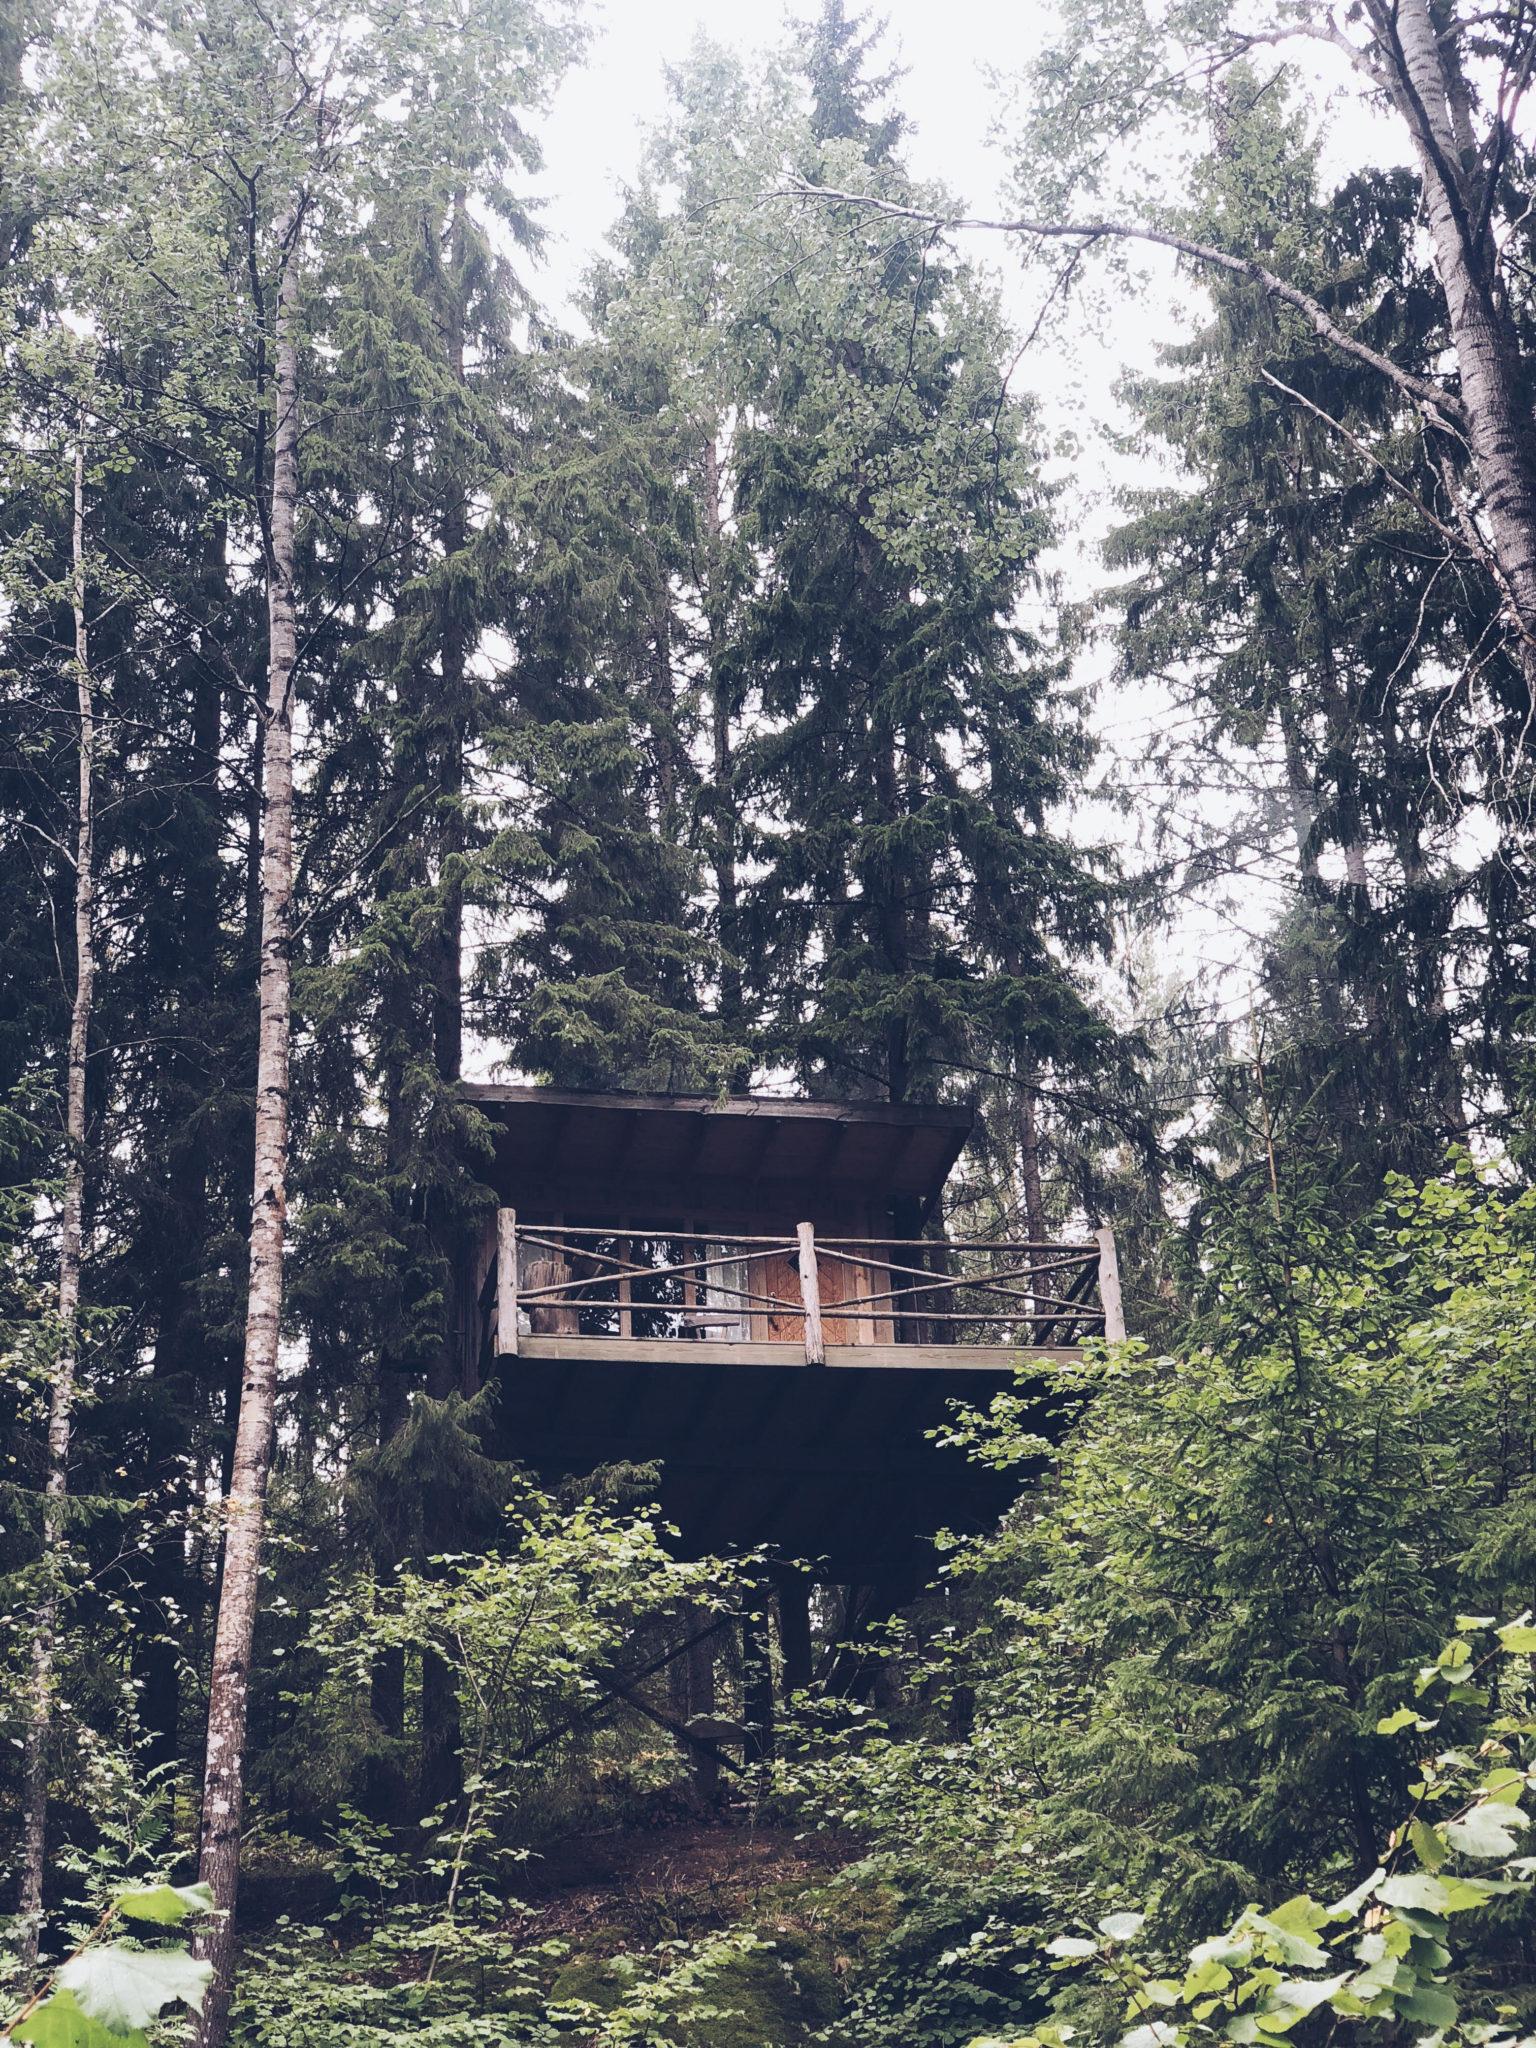 hytte-i-traerne-traetop